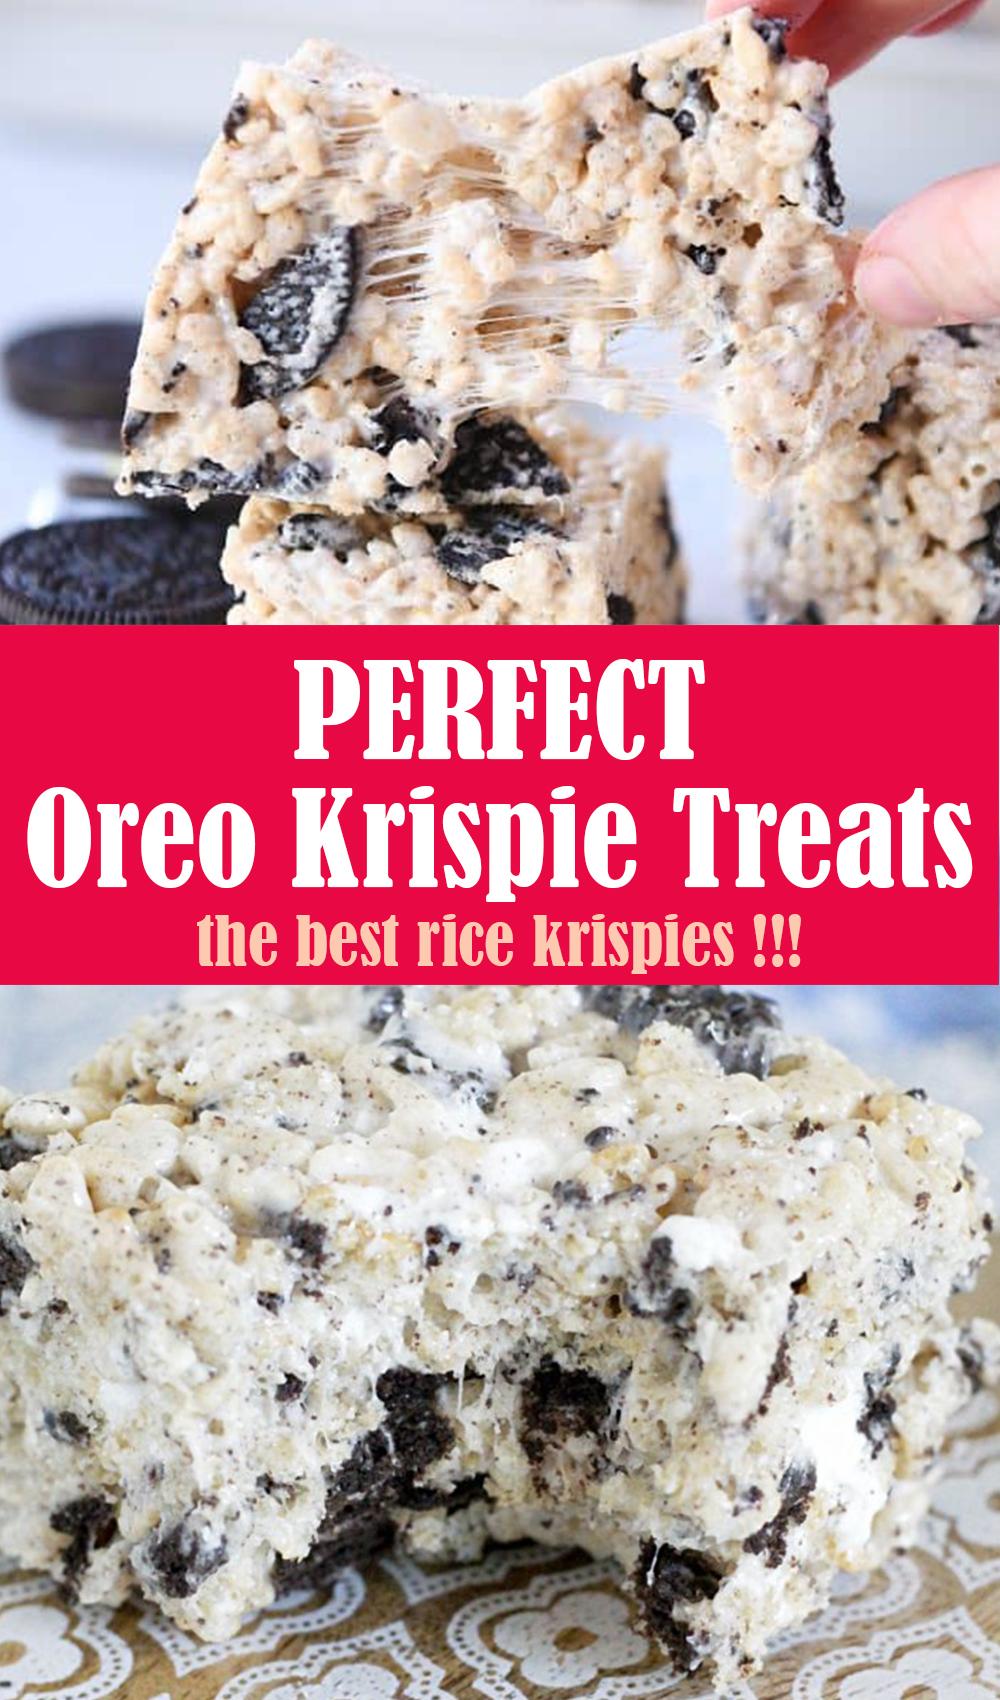 Oreo Krispie Treats Recipe